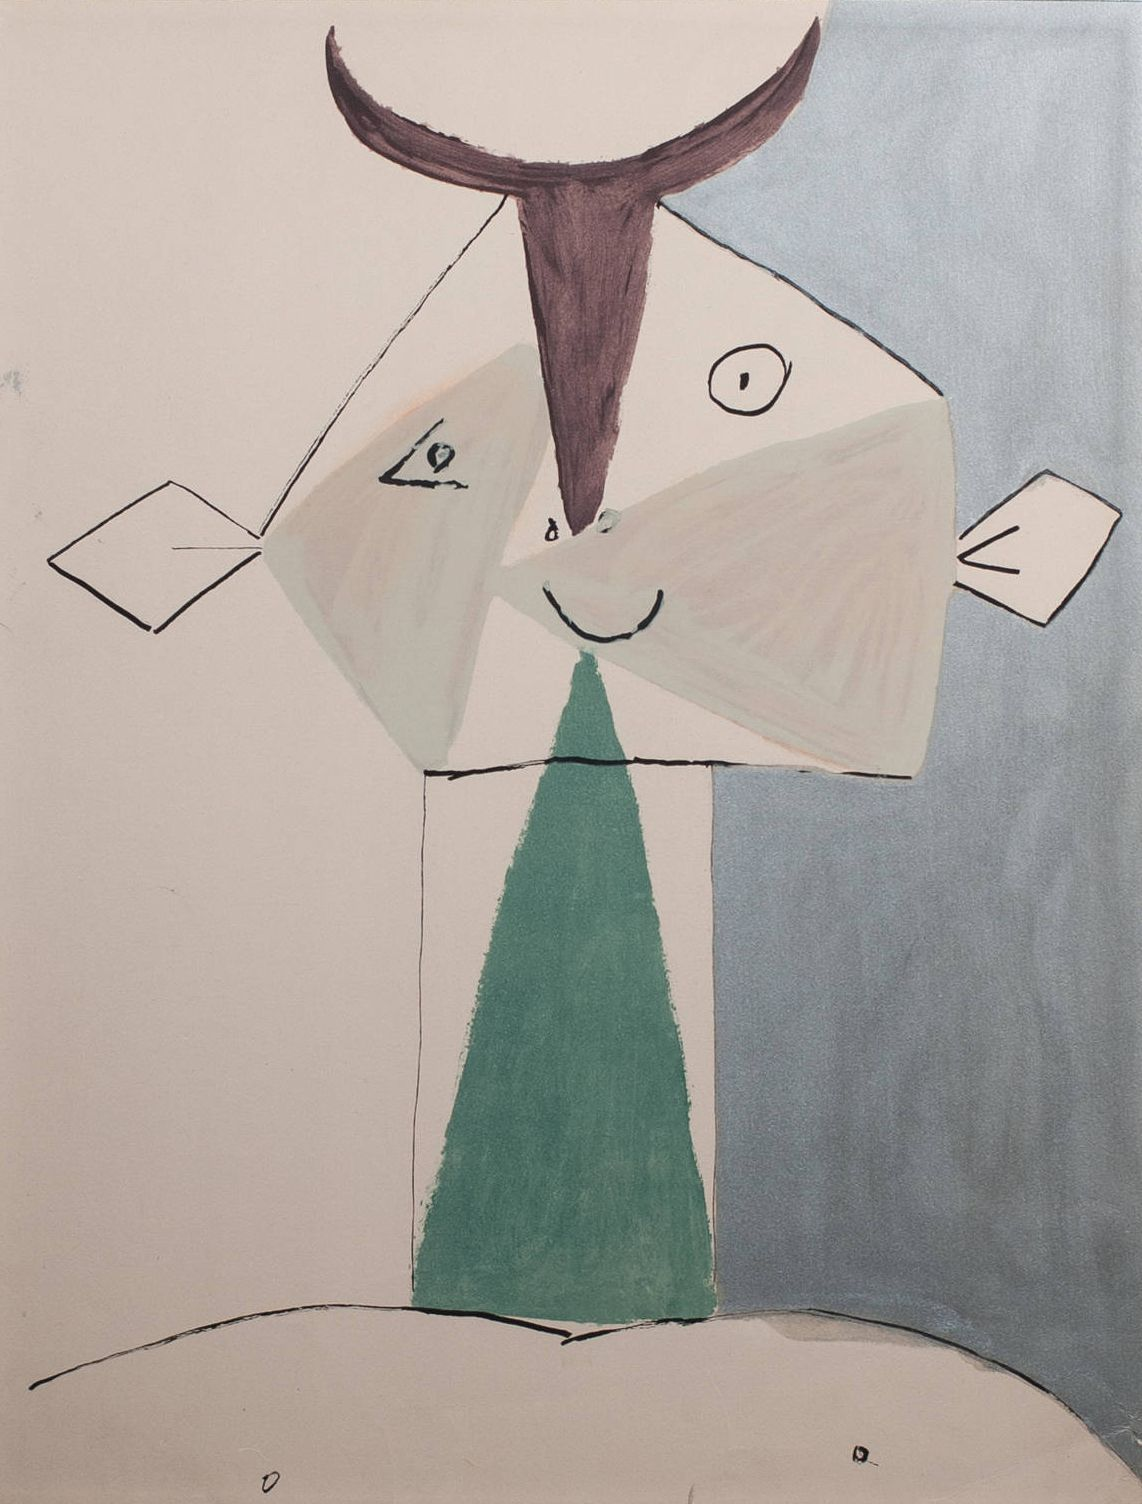 Pablo Picasso: Large Faun (1960)